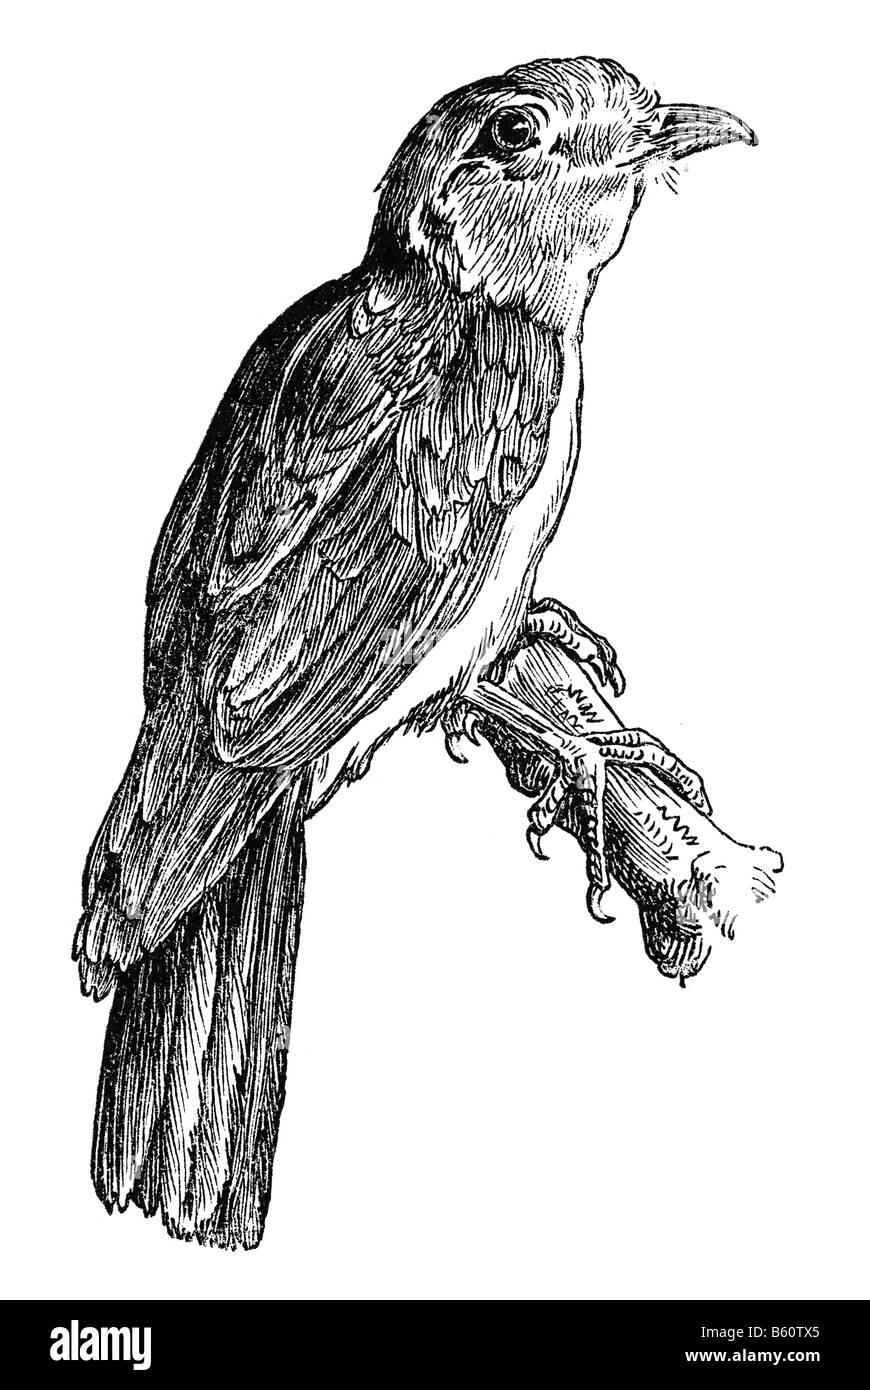 Cuckoo-roller (old name Leptosomus afer) (Leptosomus discolor), Courol Stock Photo